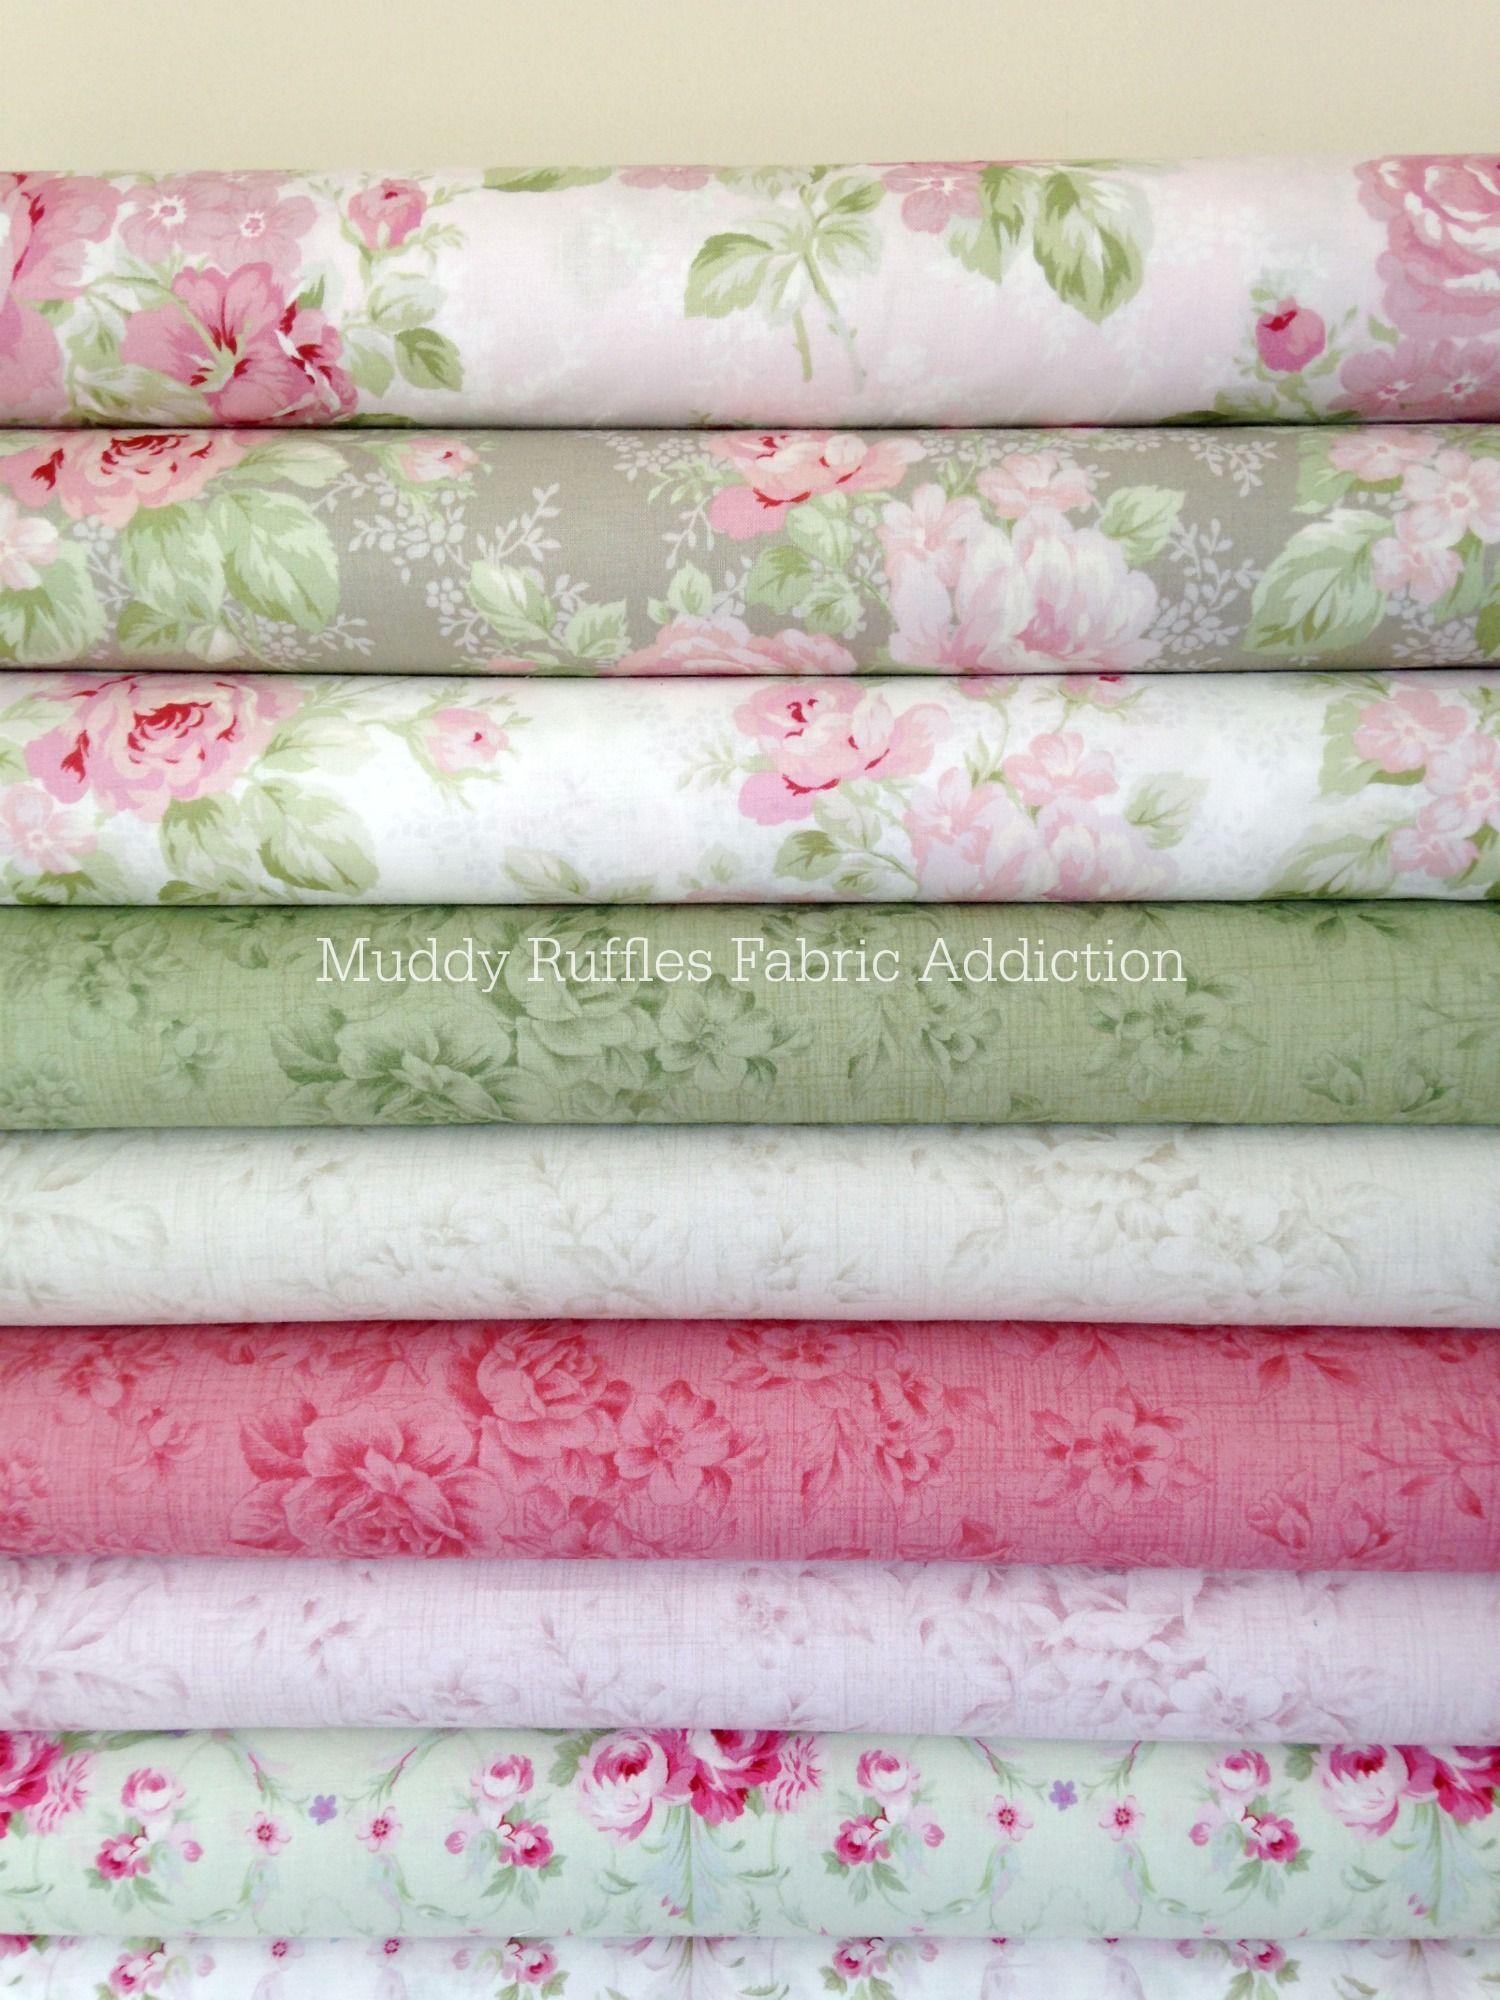 Pin by Muddy Ruffles Fabric Addiction on FABRIC INSPIRATION 1500x2000